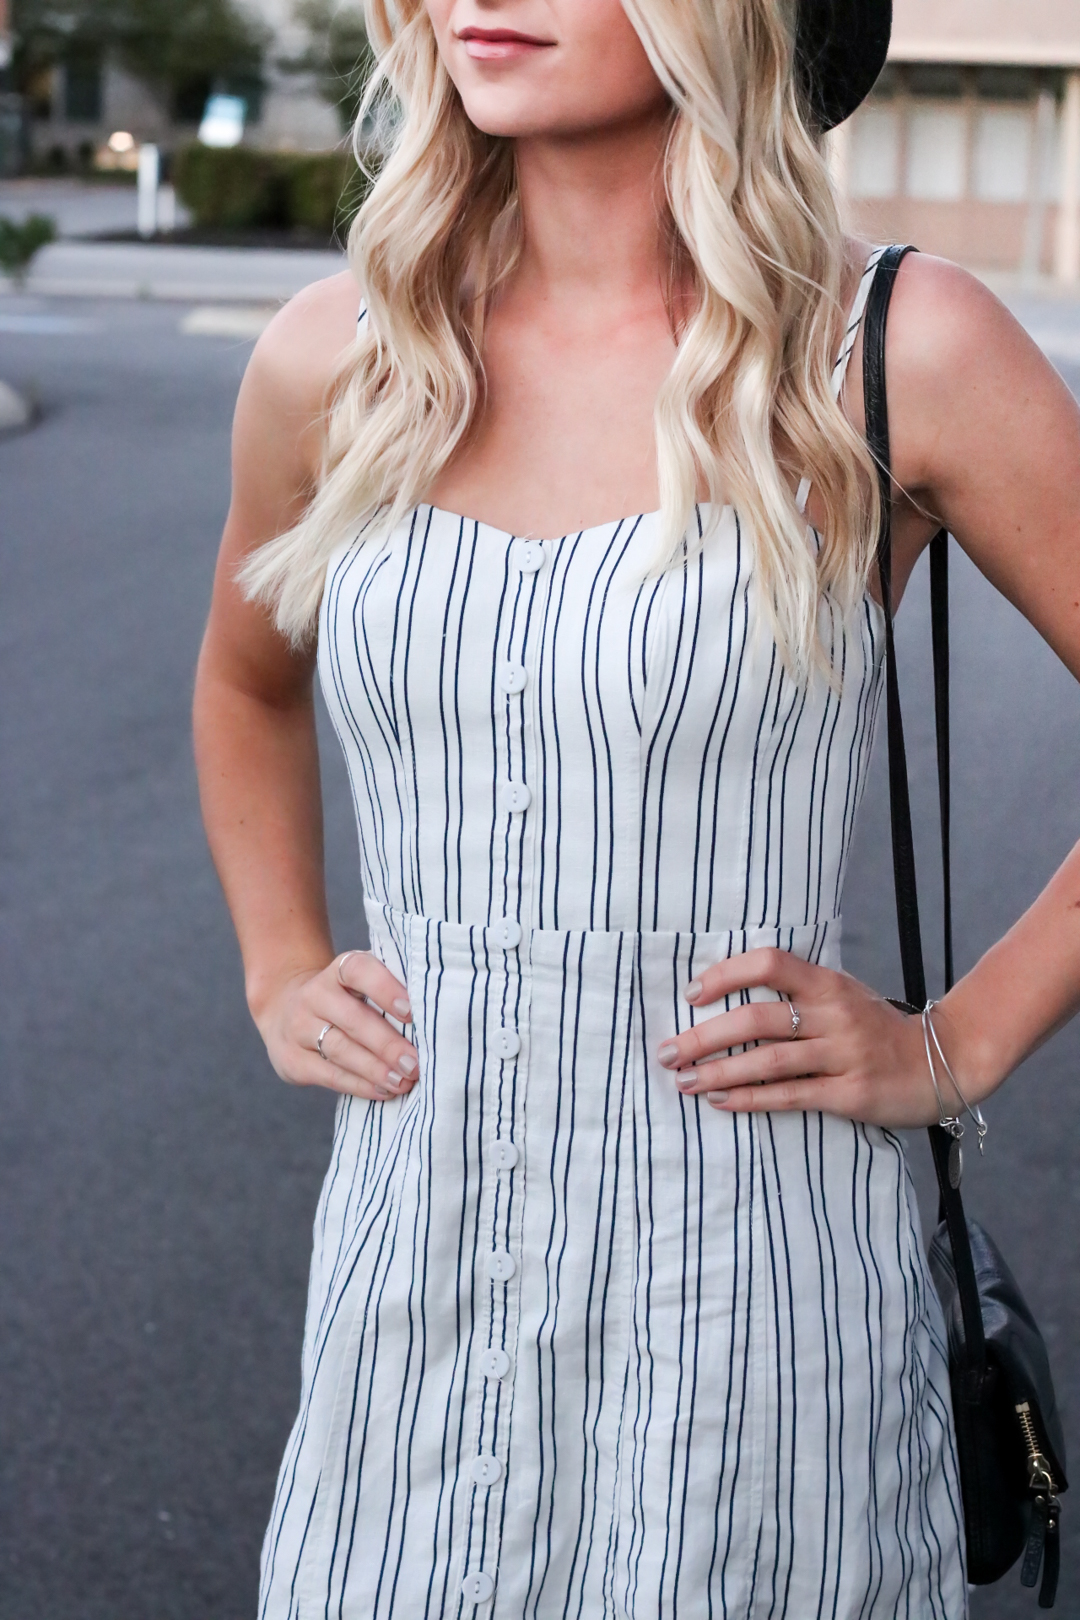 Striped Urban Outfitters Mini Dress-7.jpg